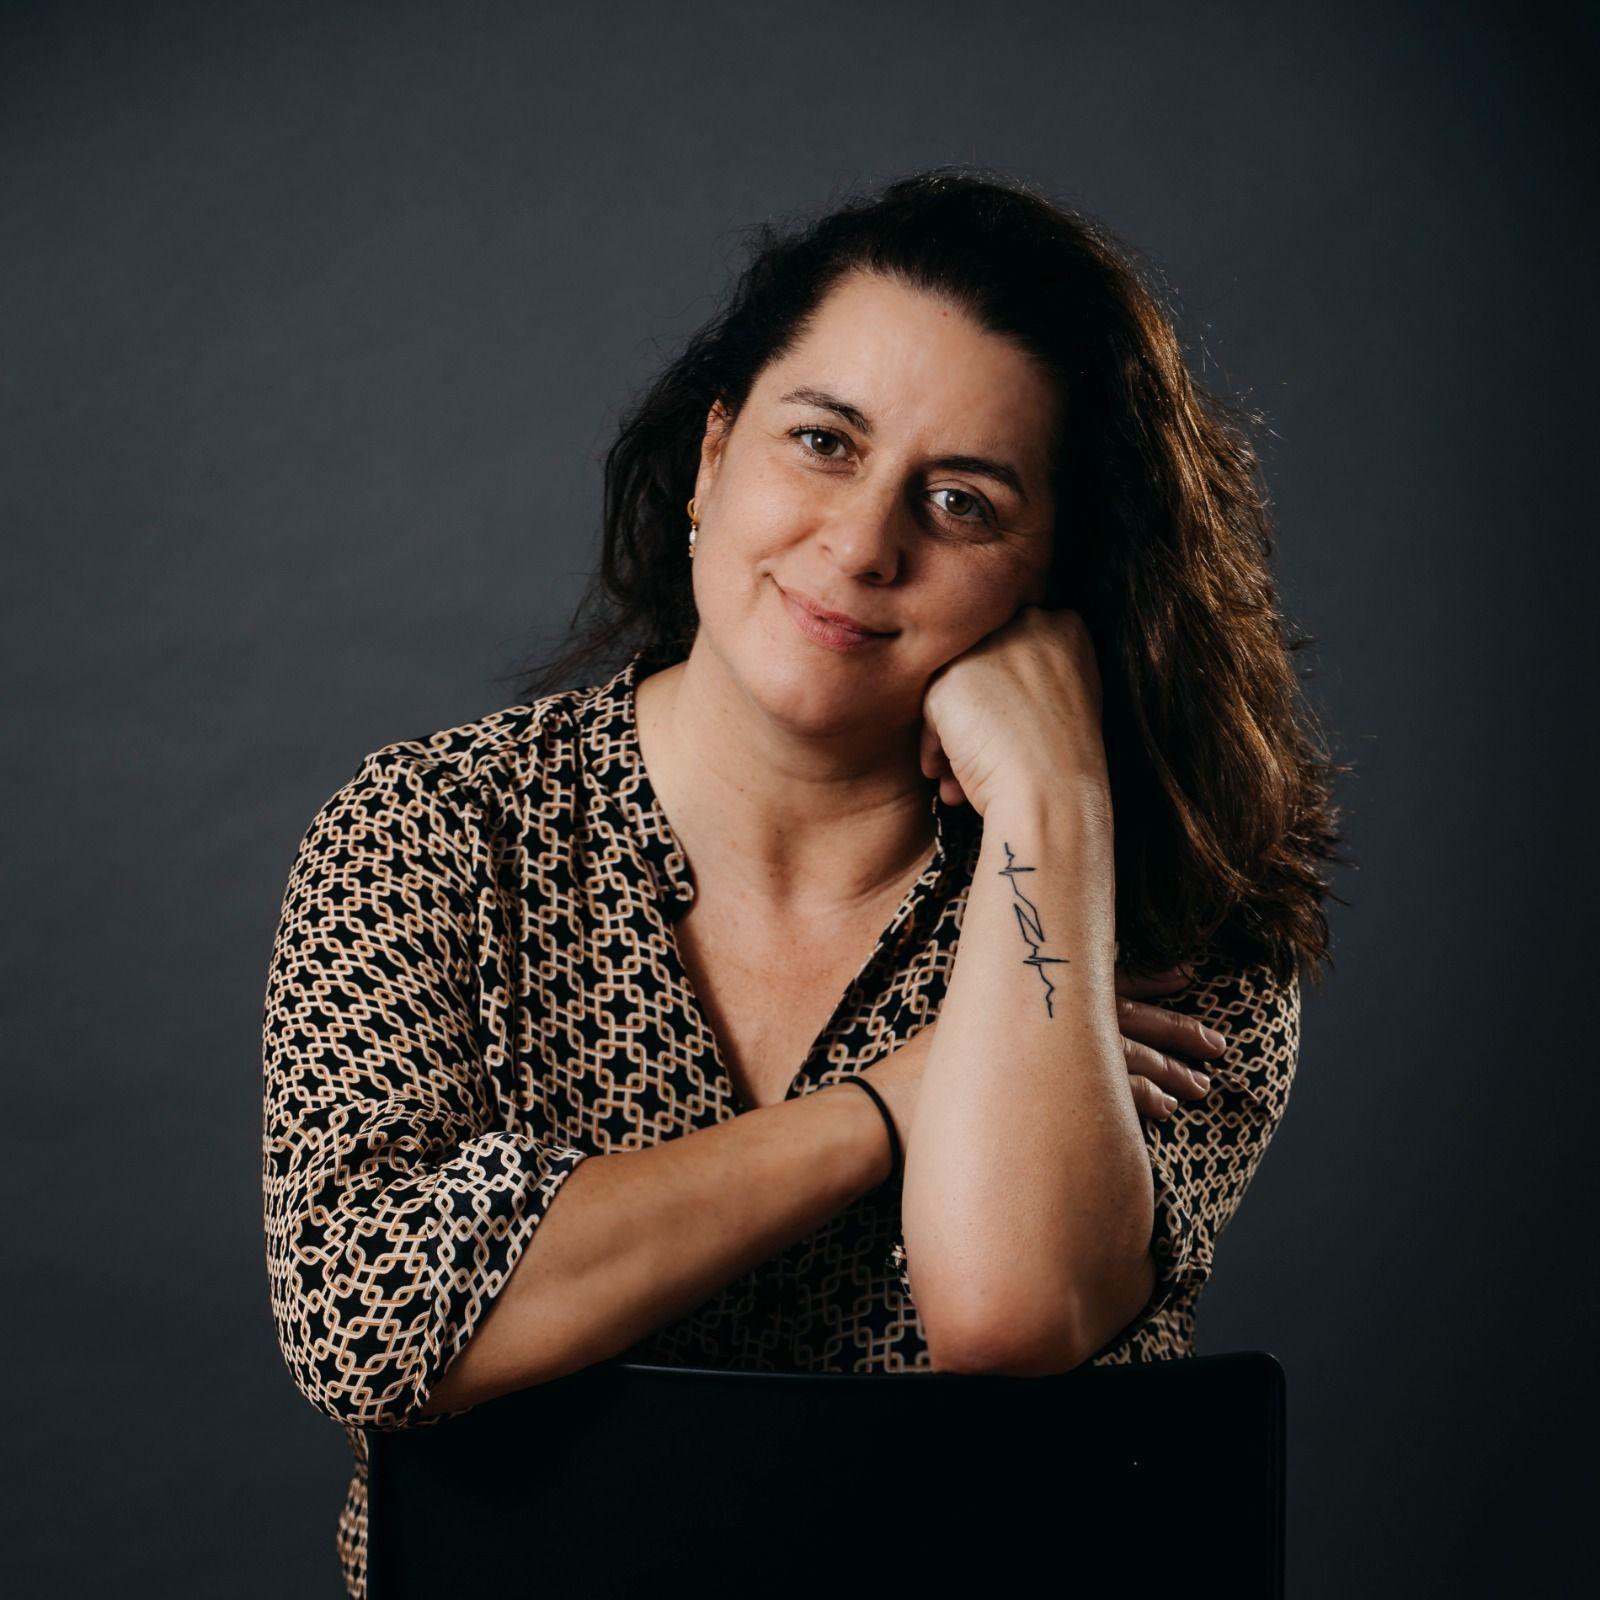 Leticia Oliva